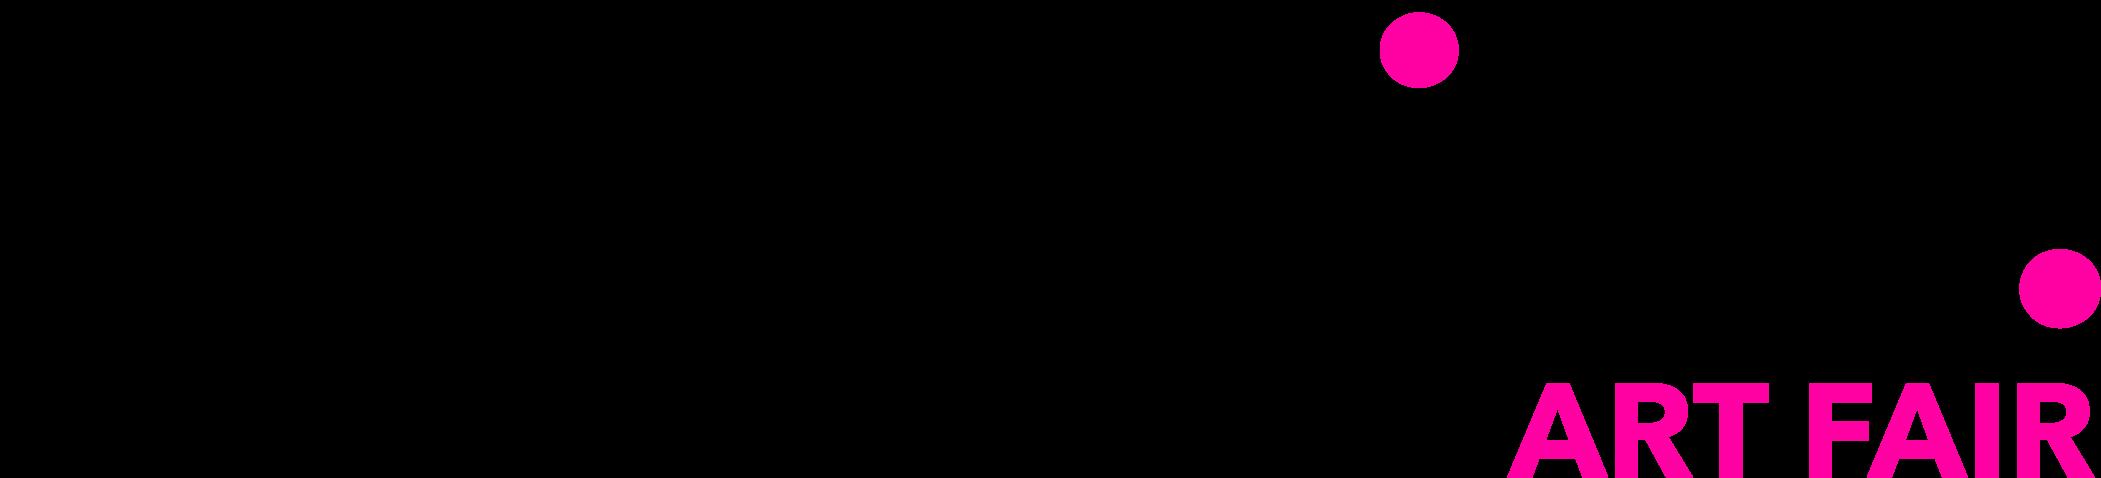 Superfine! 2019 Logo-06.png